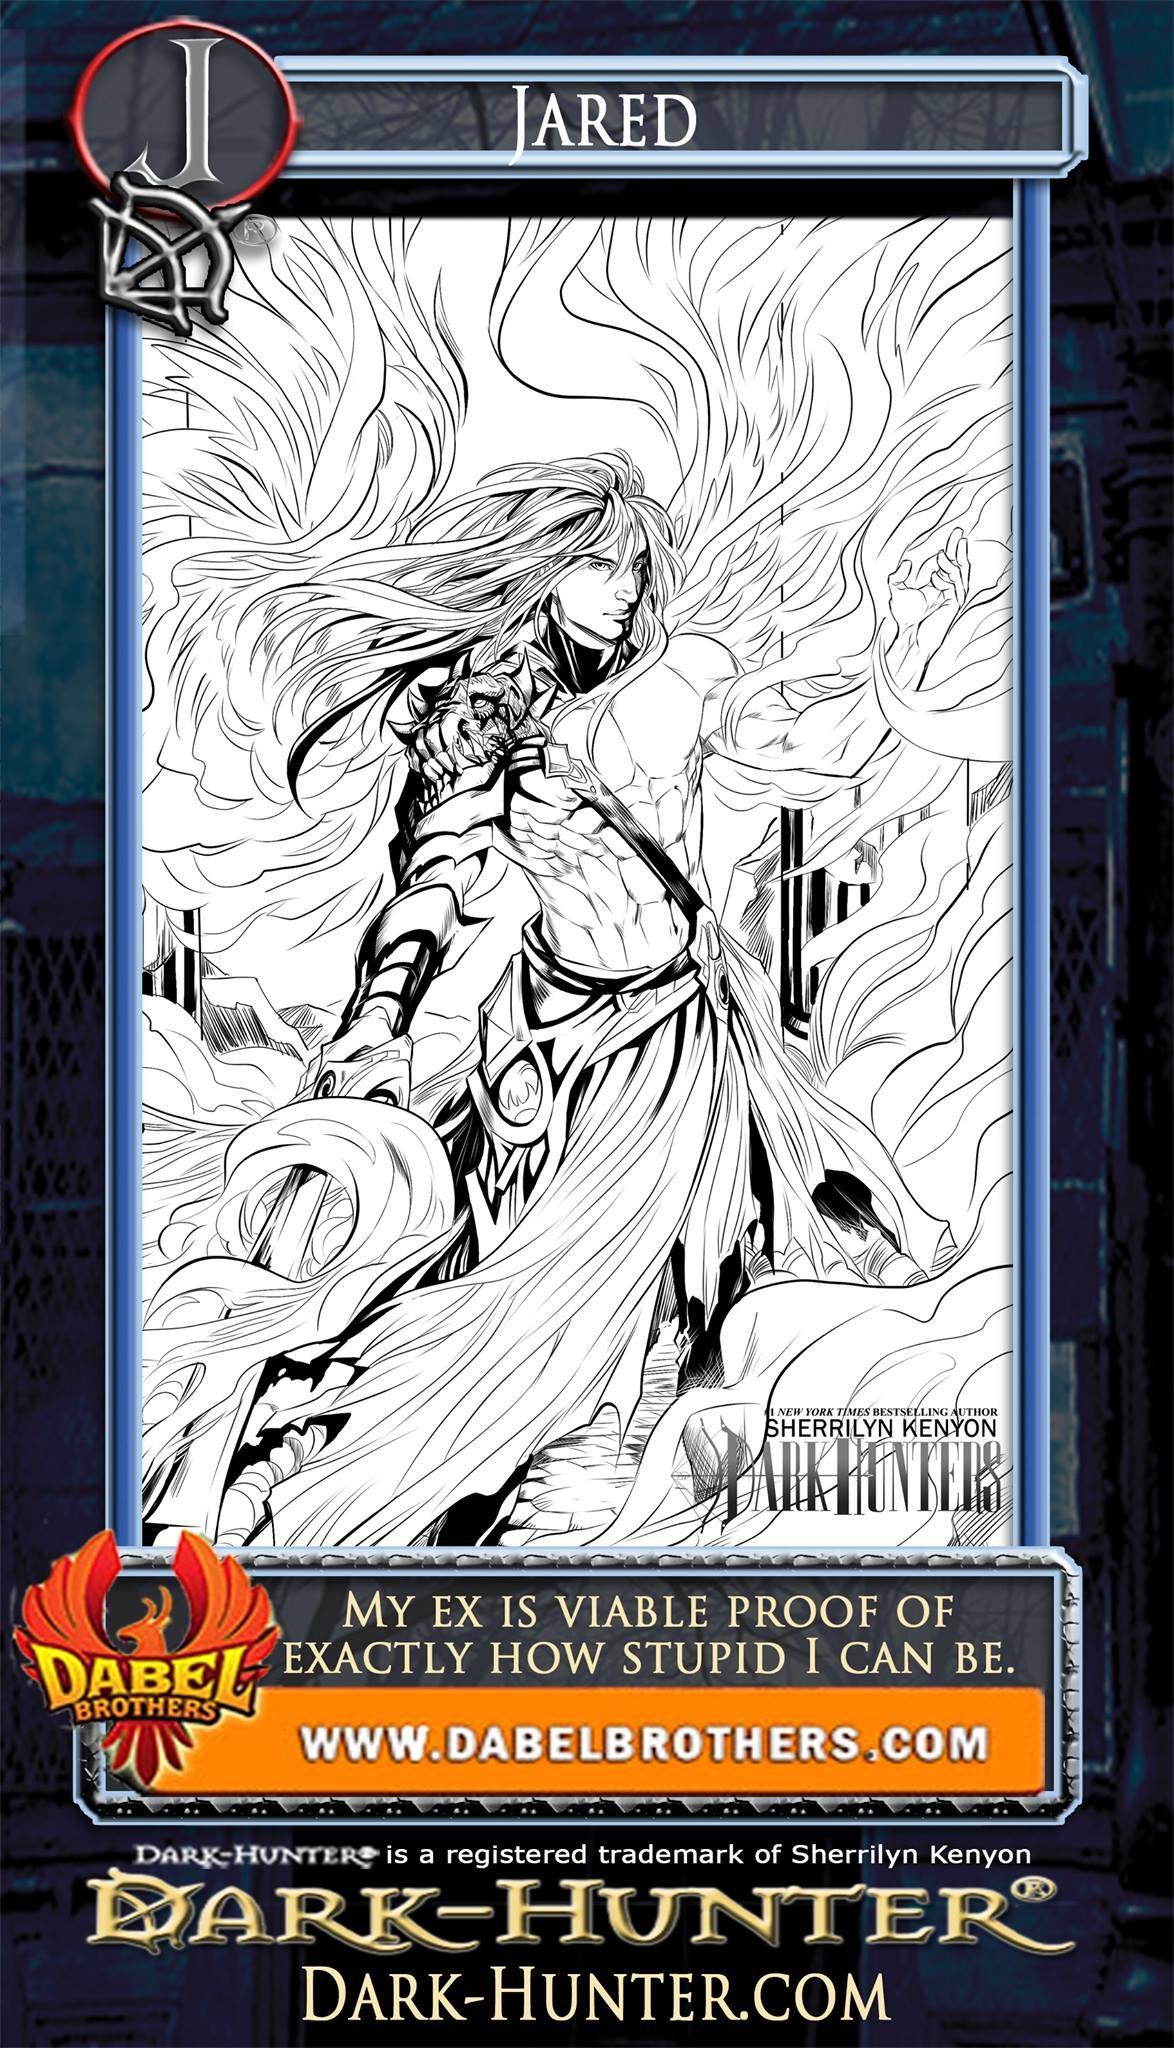 Sherrilyn Kenyon Fav Characters By Rainbowcat22 On Deviantart